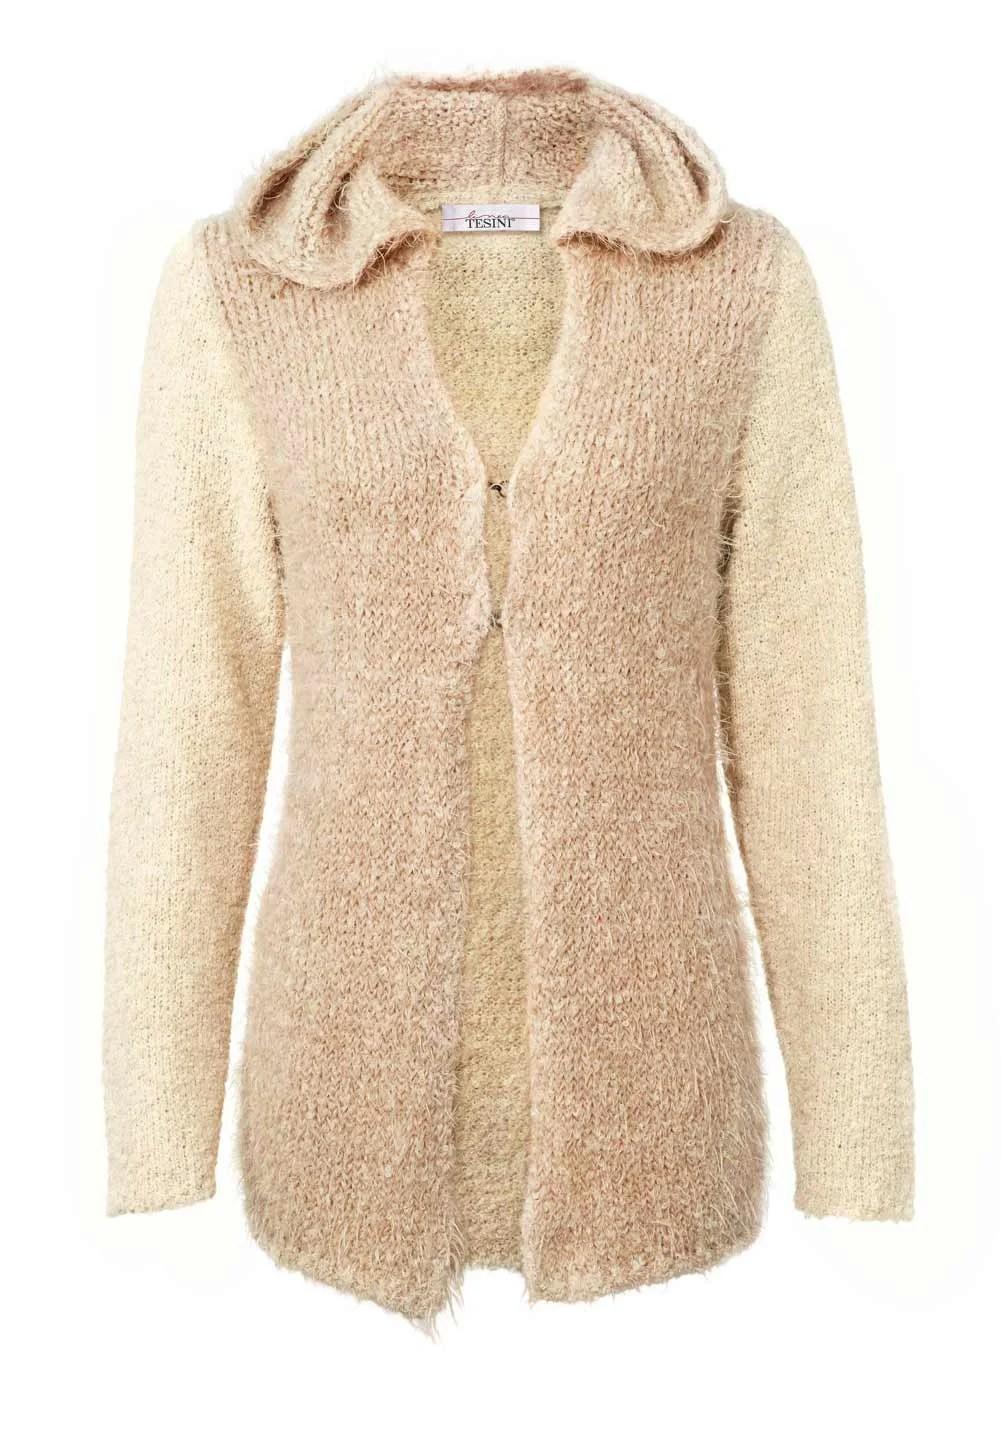 023.441 Damen Strickjacke lang neu Damen Cardigan Pullover puder-creme Longstrickjacke